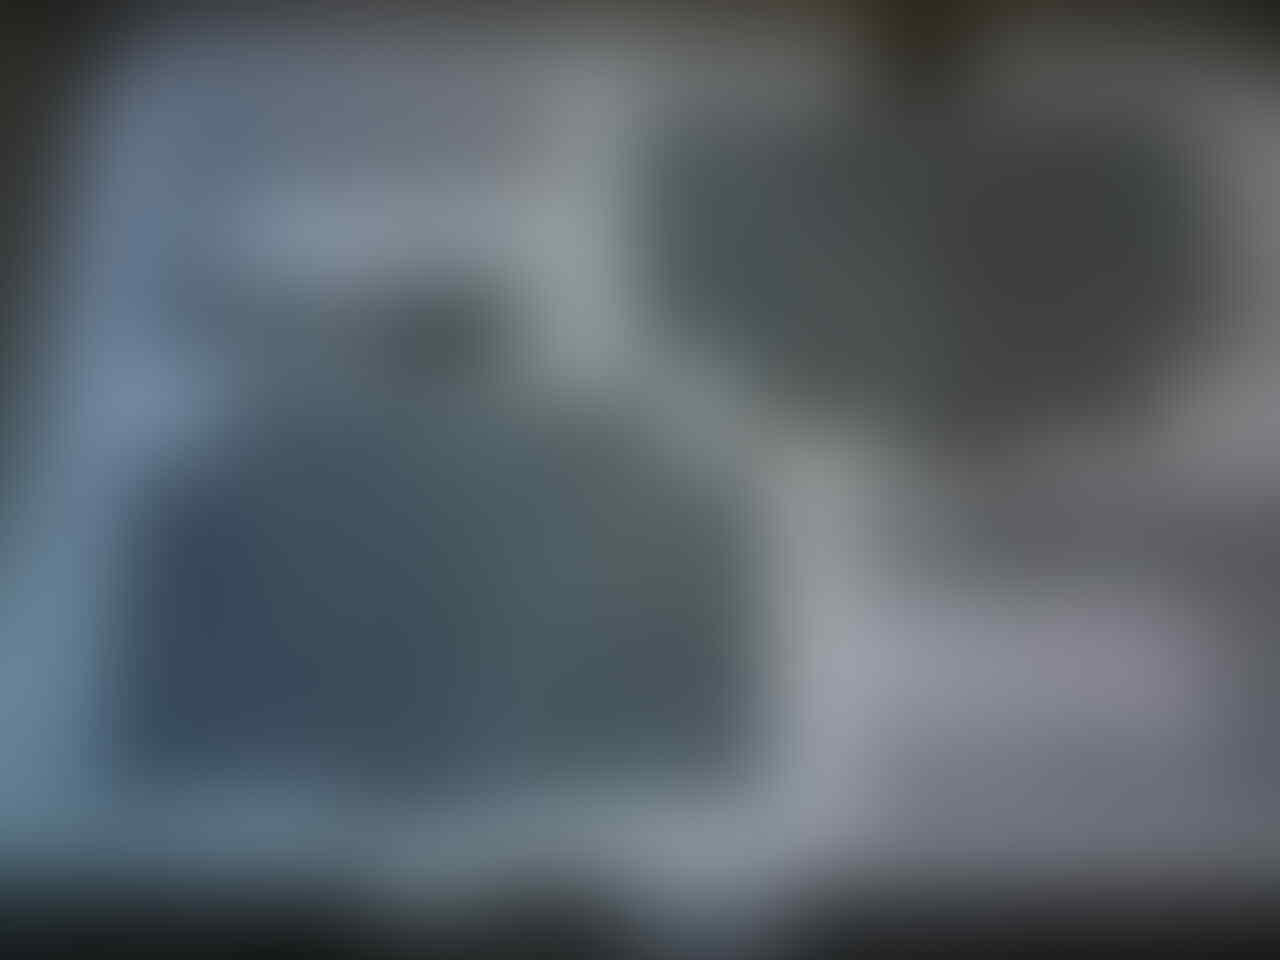 [RAVYN] dbE Acoustic SP77 rev 2 with Tweeter aktif, SPEAKER LEGENDARIS! NEW BNIB !!